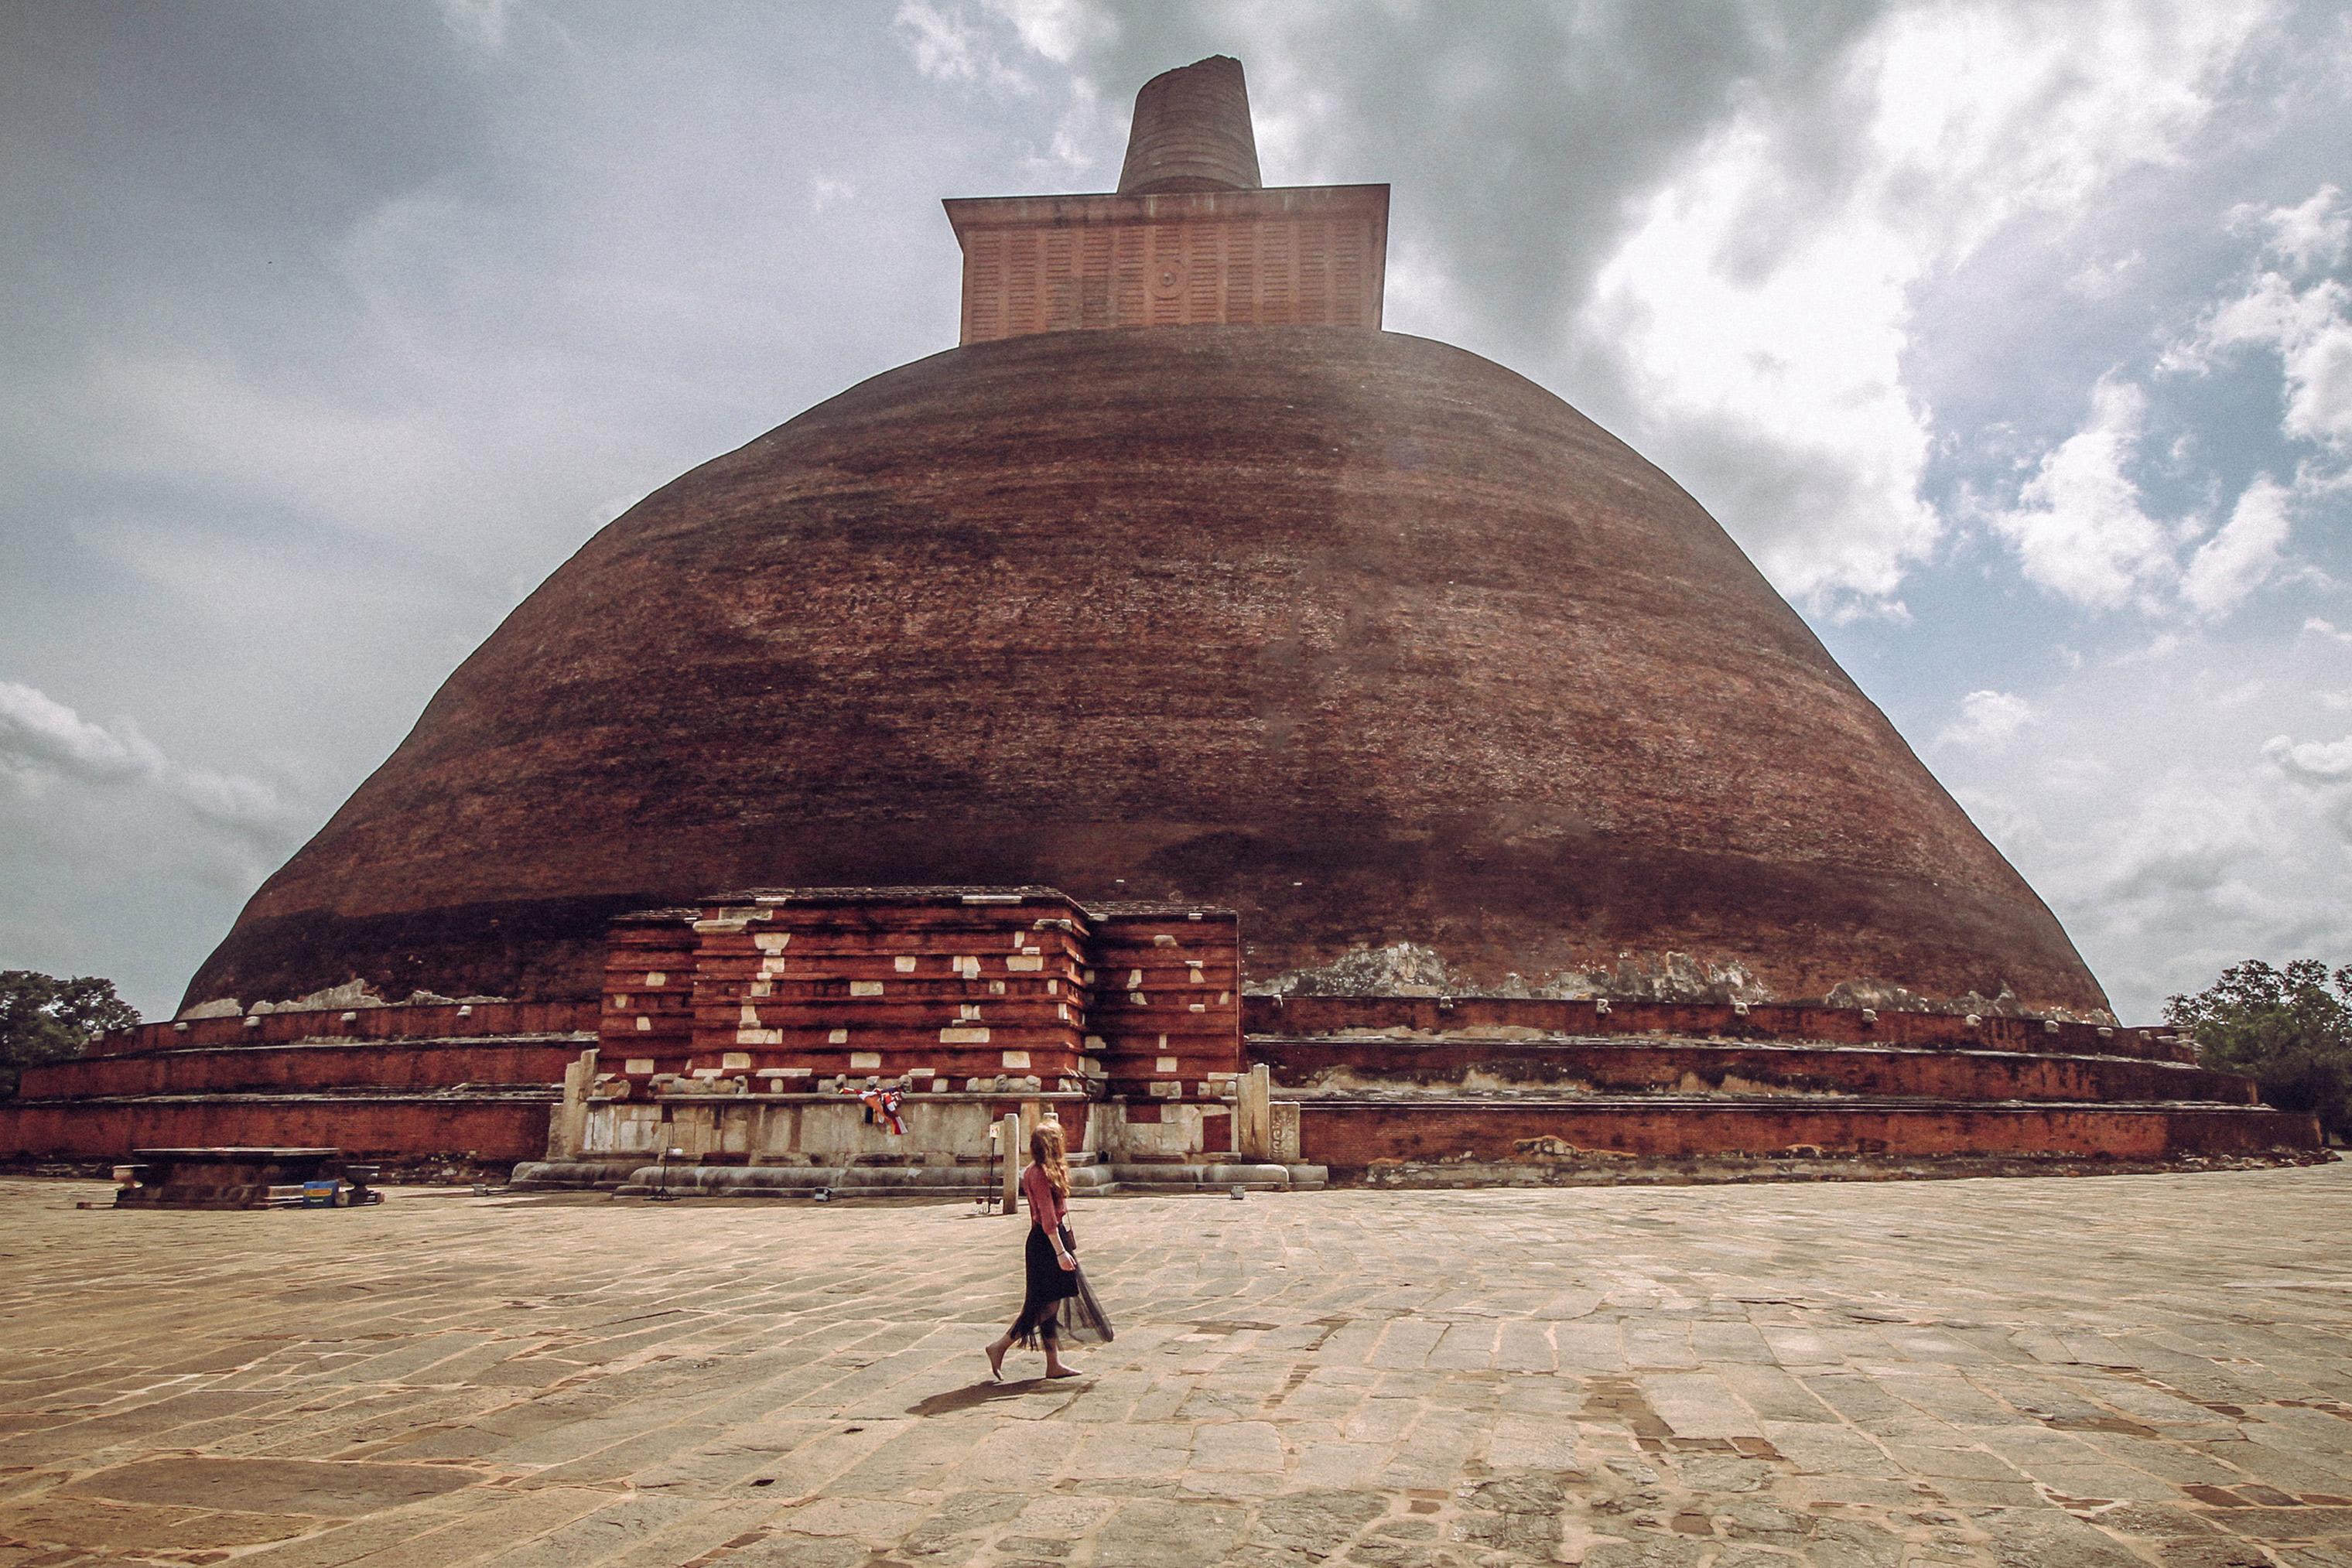 Rose Trafford walks the circumference of the Anuradhapura monastery in Sri Lanka.